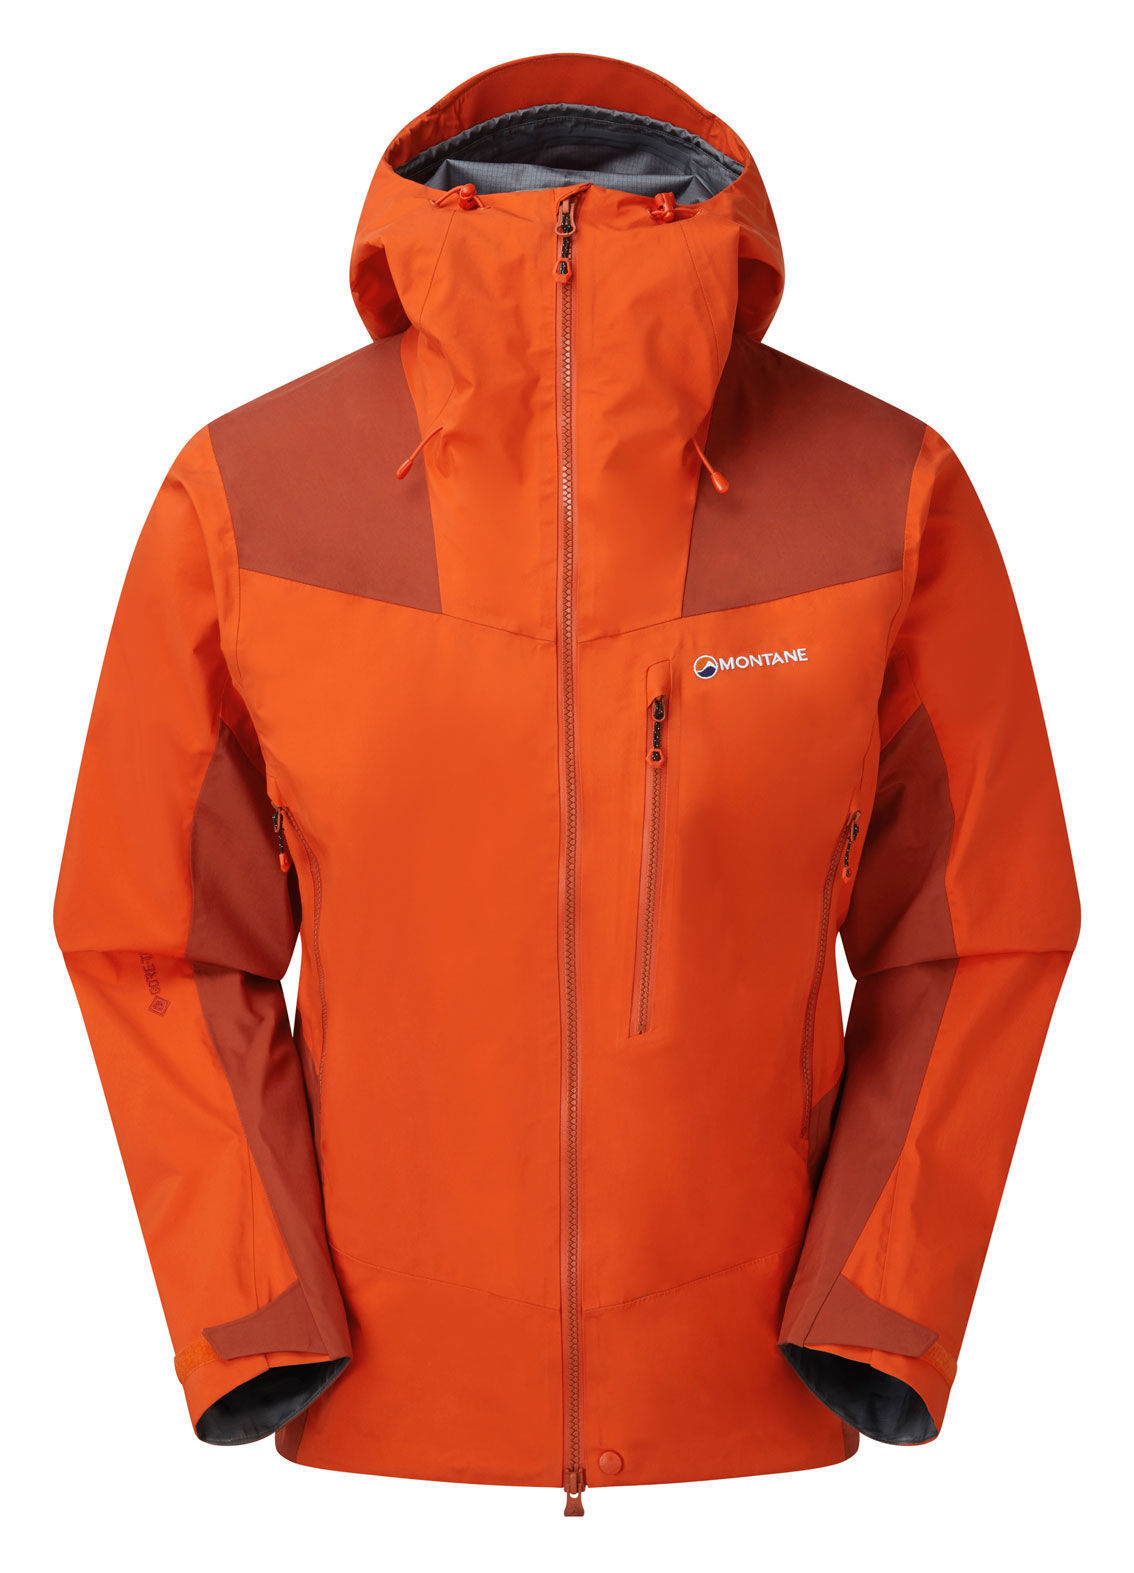 Montane Alpine Resolve Jacket, Firefly Orange, L